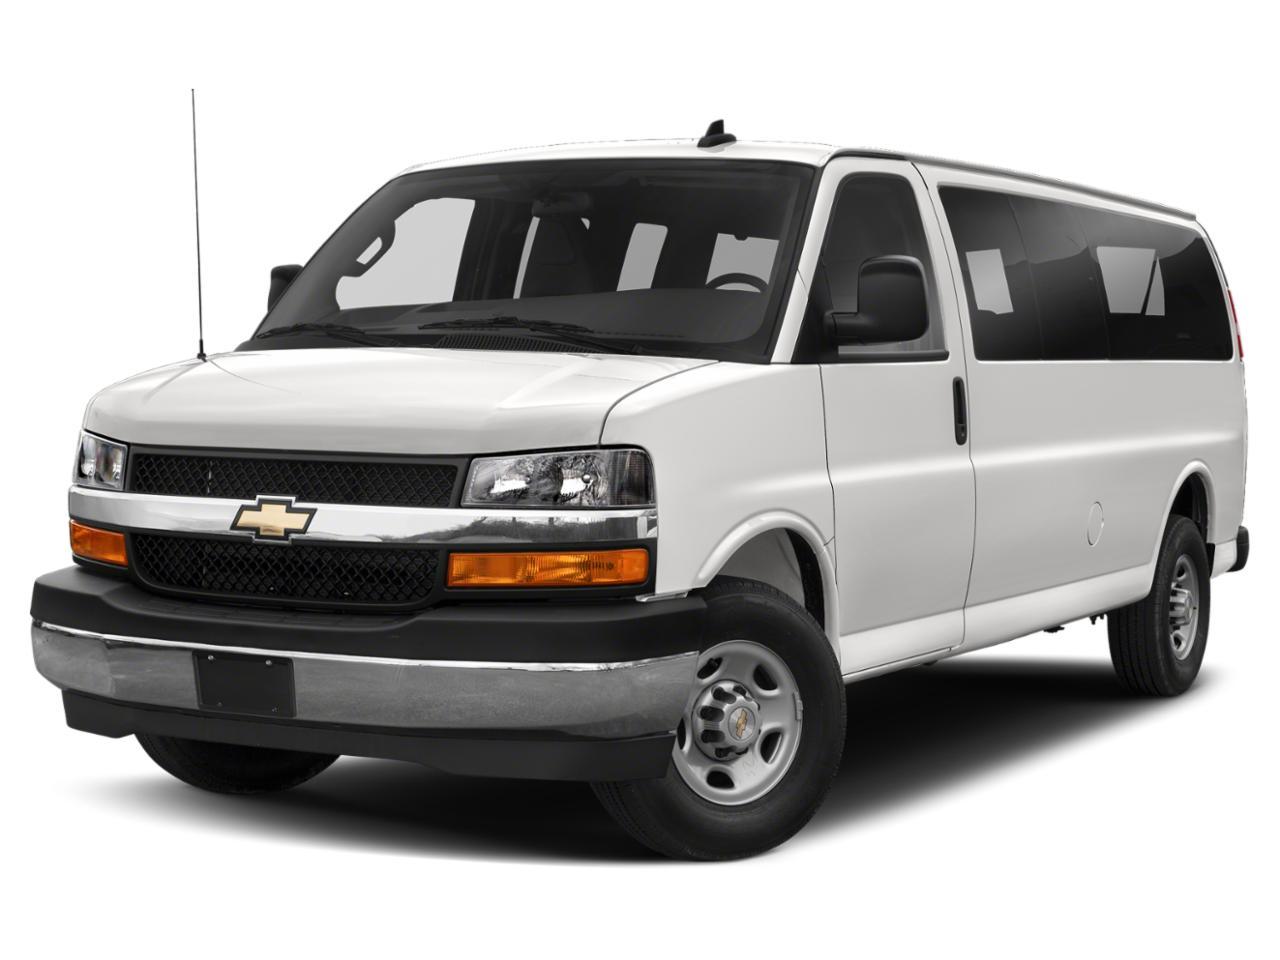 2019 Chevrolet Express Passenger Vehicle Photo in Saginaw, MI 48609